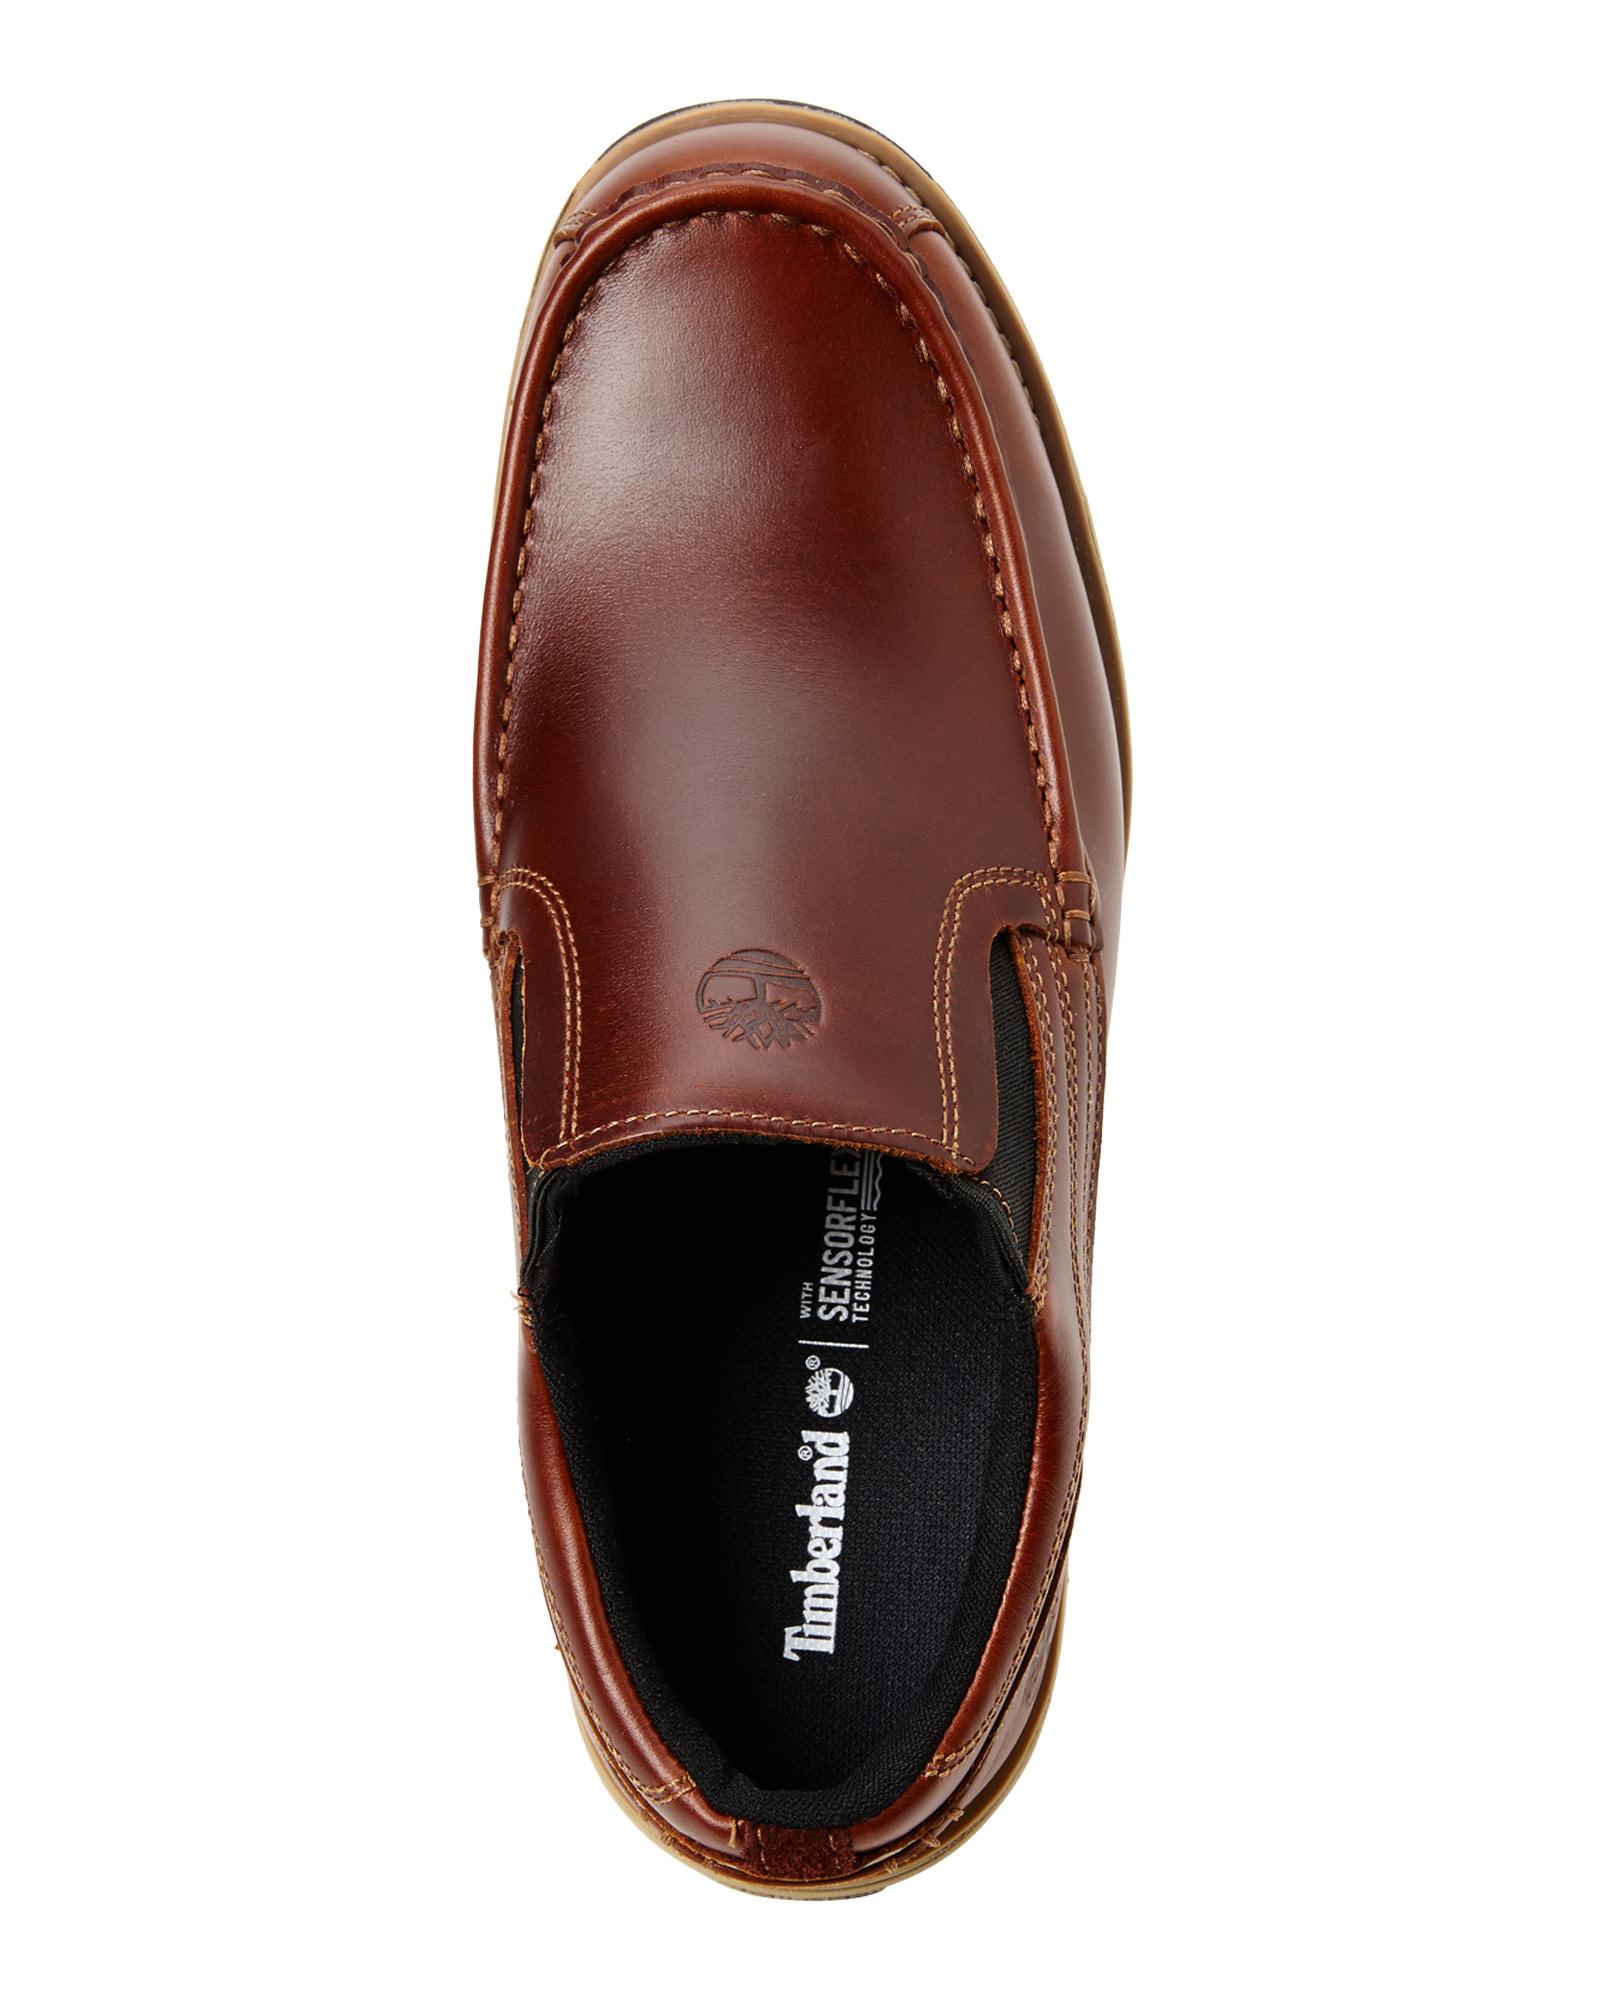 reducerat pris halva priset olika färger Timberland Whiskey Heston Slip-On Shoes in Brown for Men - Lyst